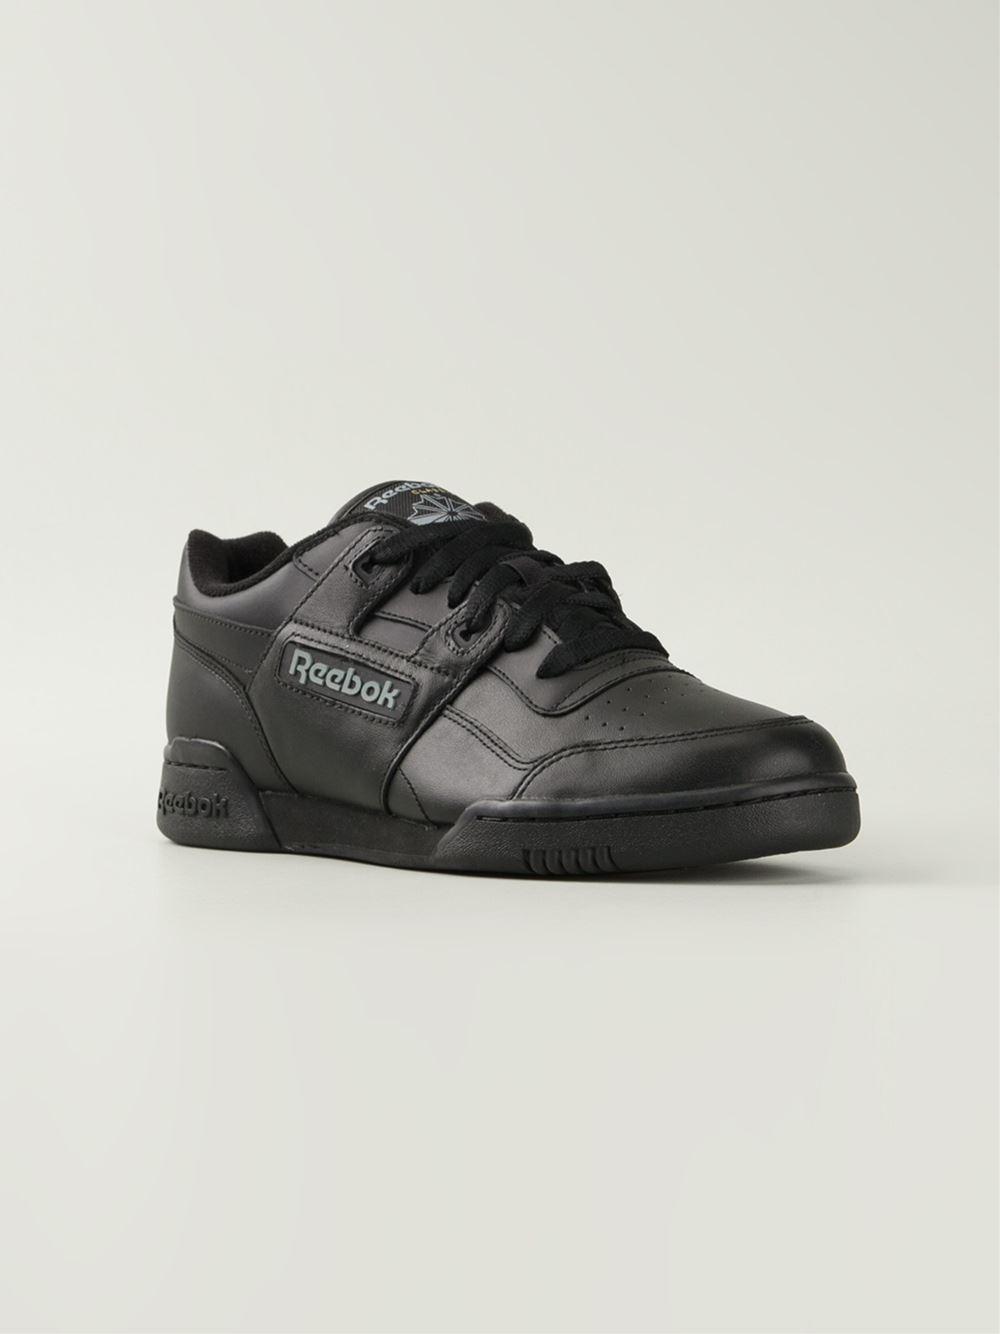 Reebok Workout Plus Leather Sneakers In Black | Lyst